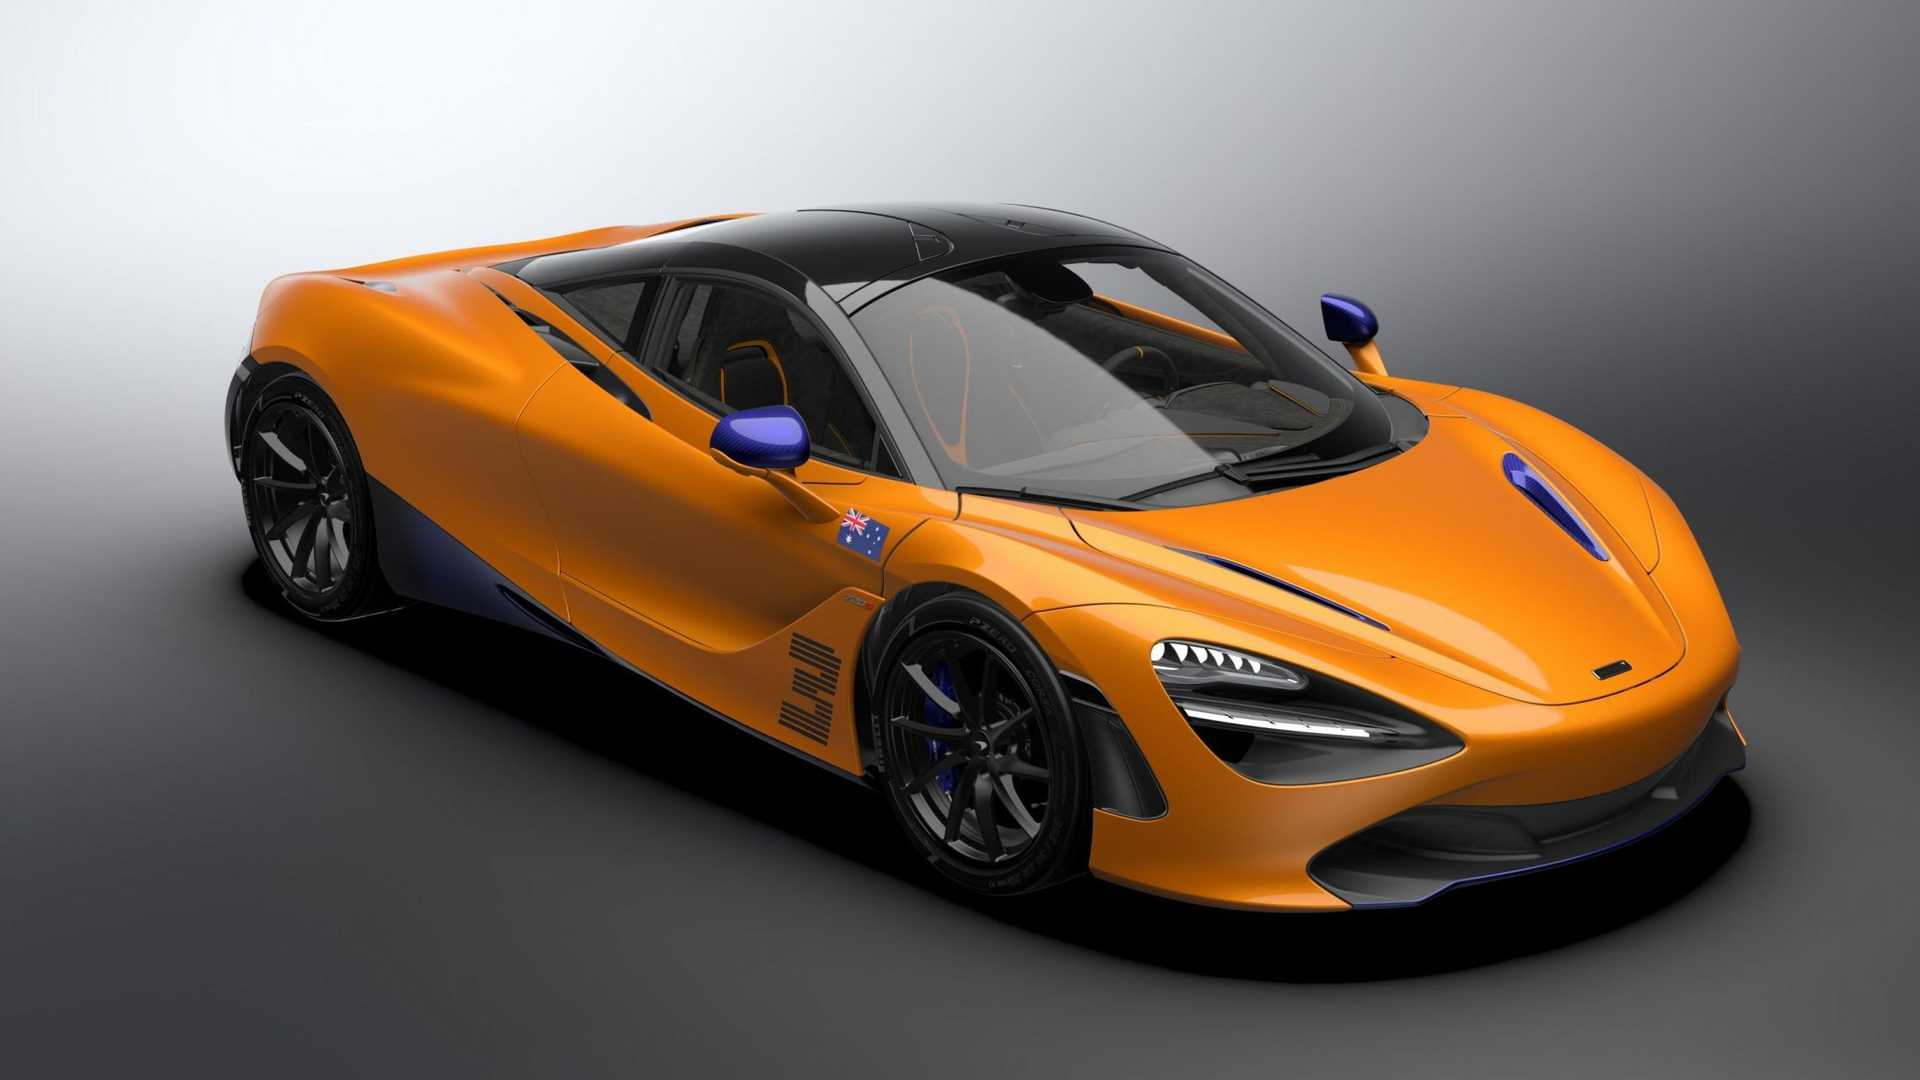 McLaren-720S-Daniel-Ricciardo-Edition-1